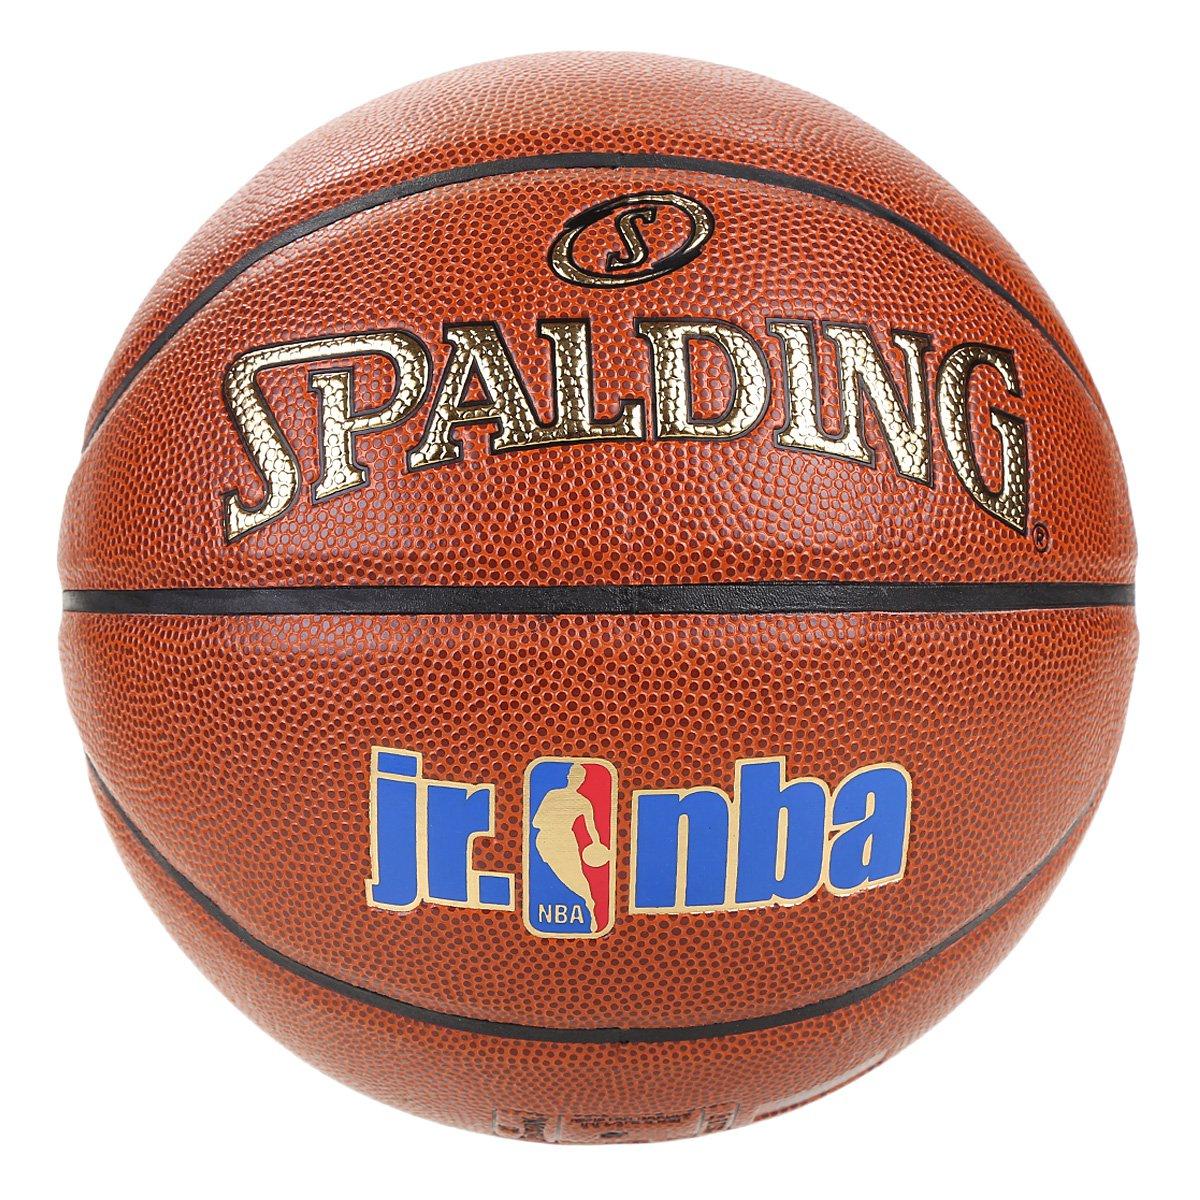 Bola Basquete Spalding NBA Jr 2015 Tamanho 7 - 1